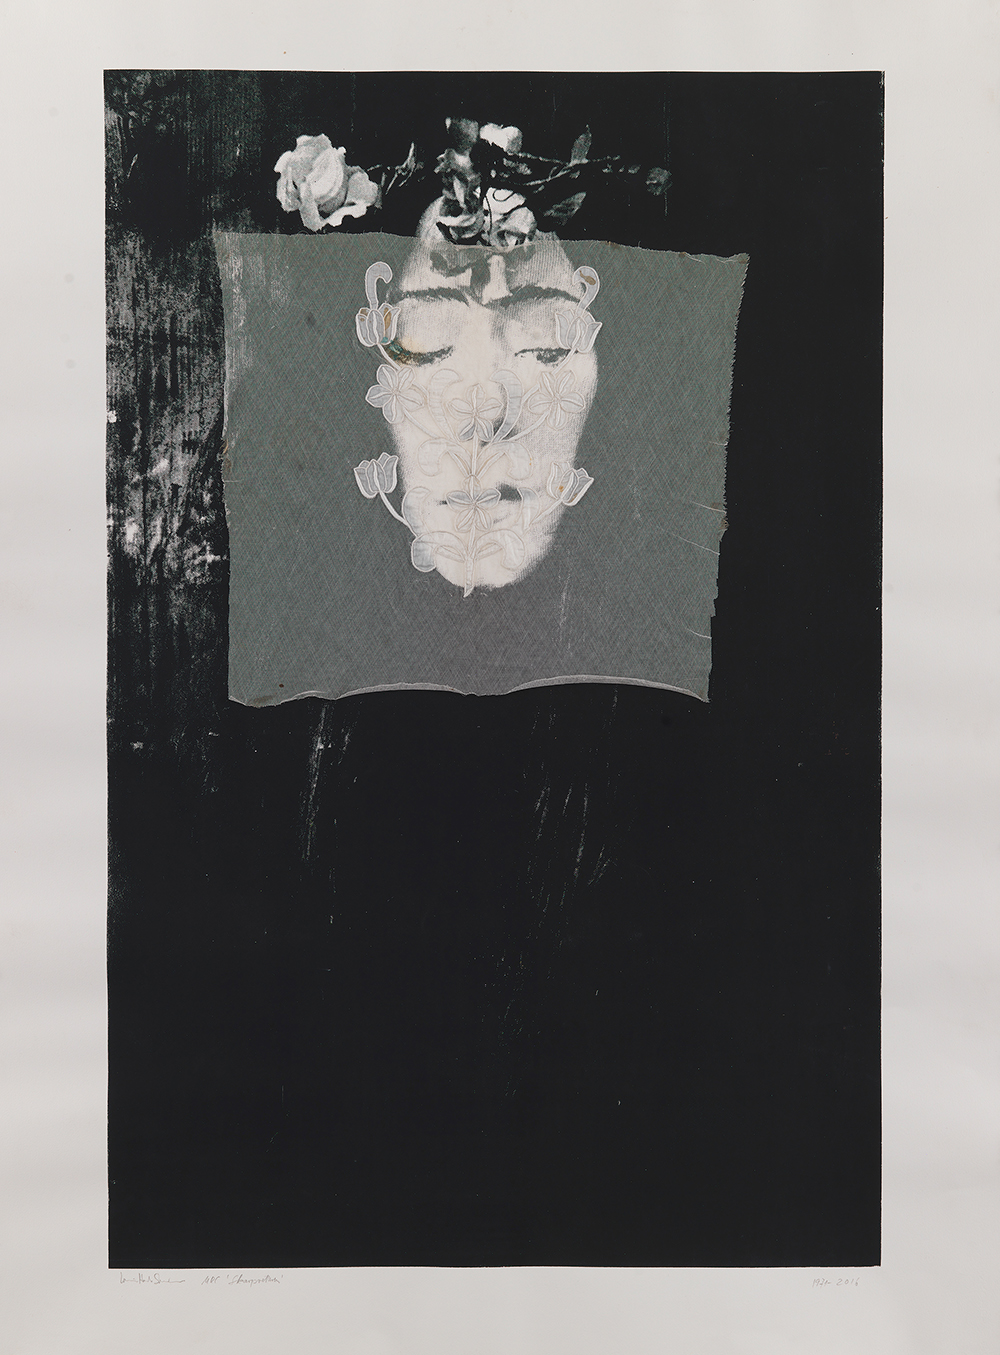 Ursula Reuter Christiansen, Skarpretteren, 1971/2016 (Silketryk) © Ursula Reuter Christiansen.